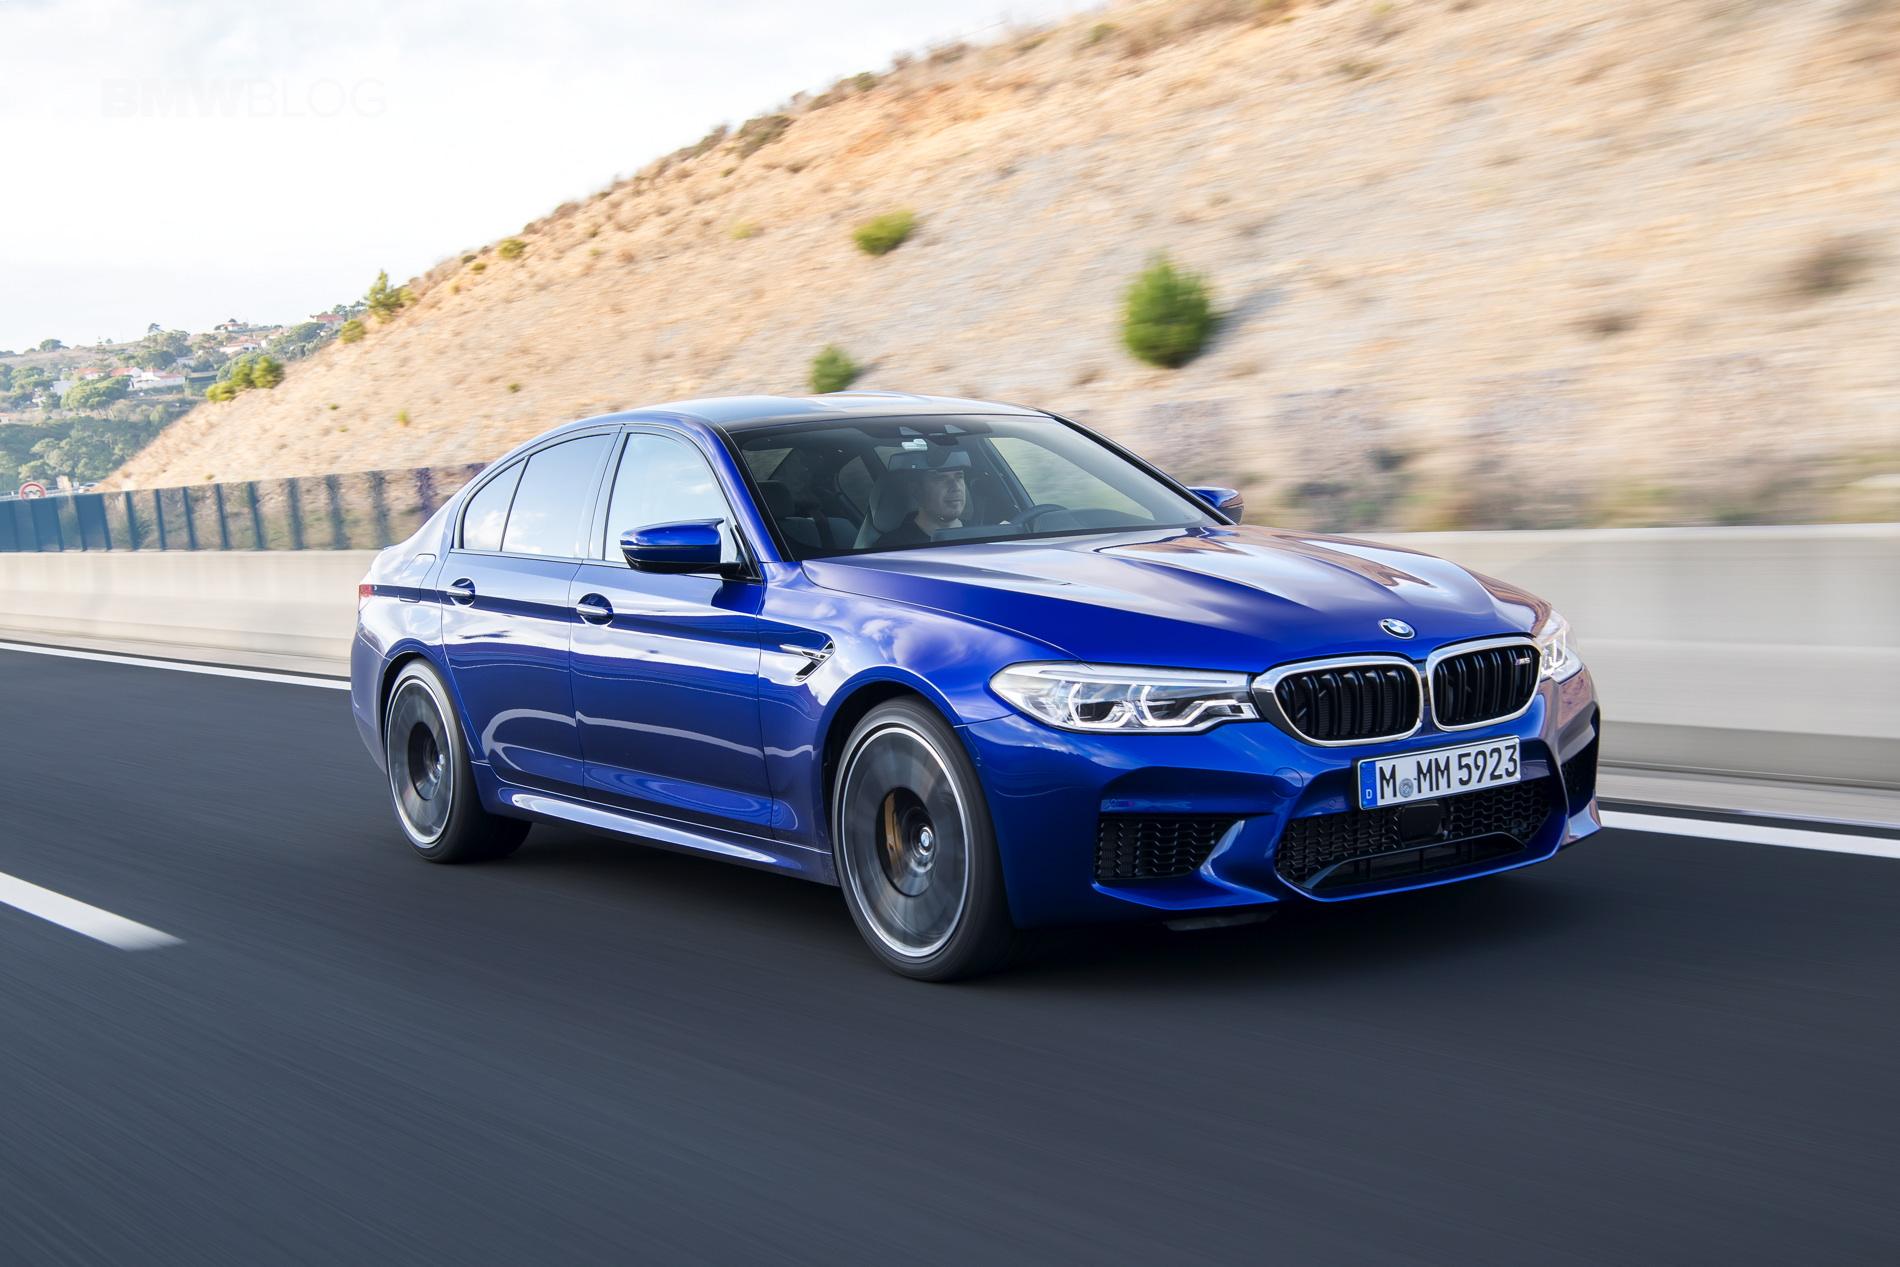 2018 BMW M5 test drive horatiu 12